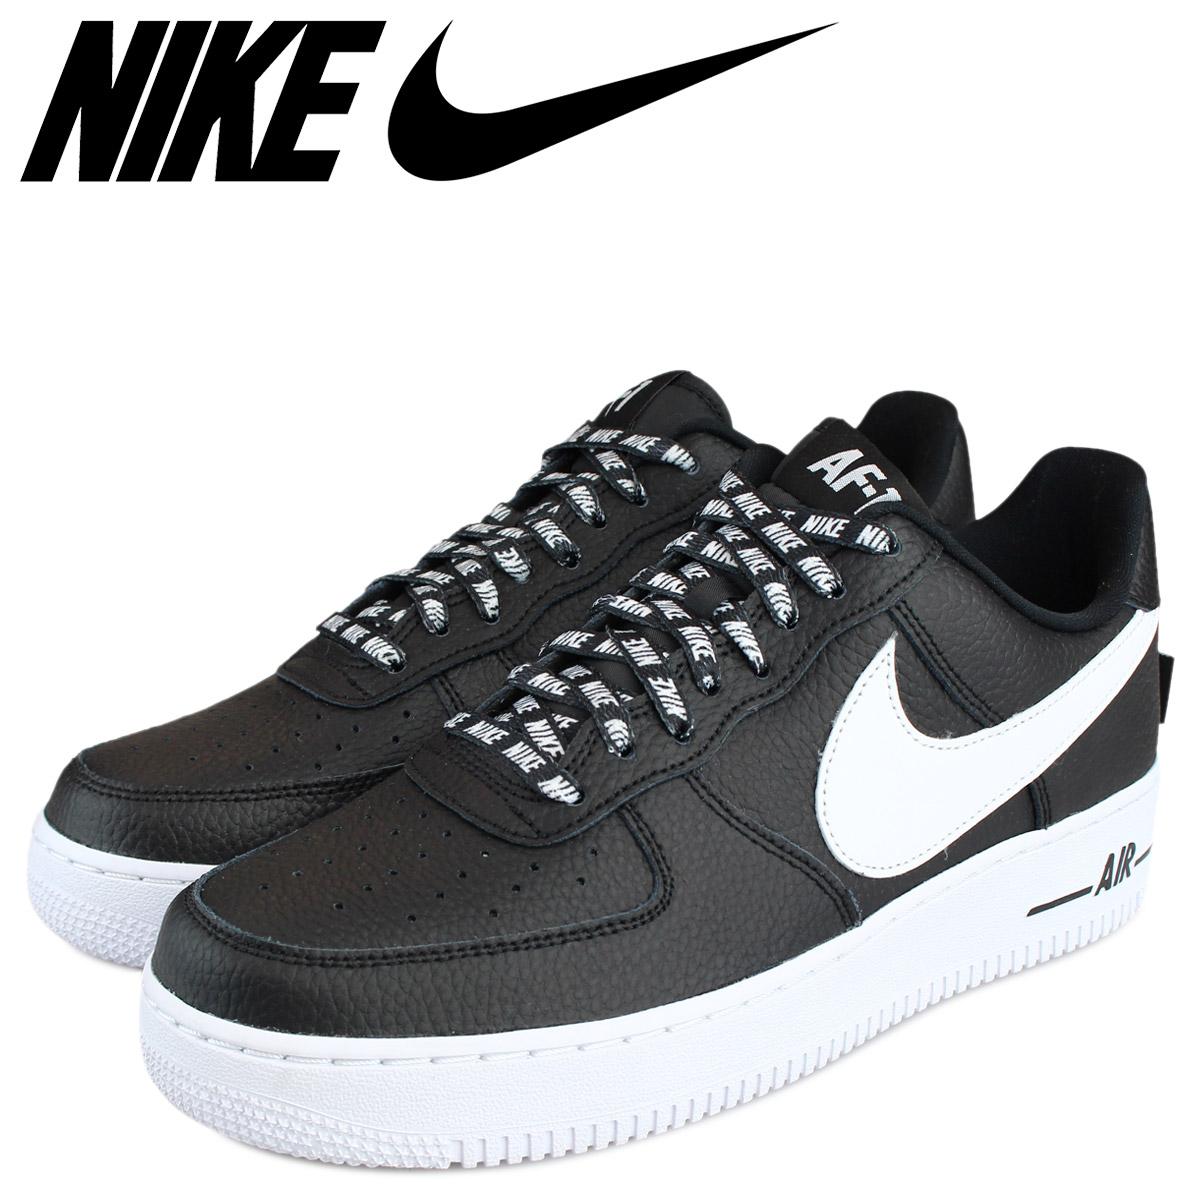 Sugar Online Shop  Nike NIKE air force 1 07 LV8 sneakers AIR FORCE 1 ... c74c36e83